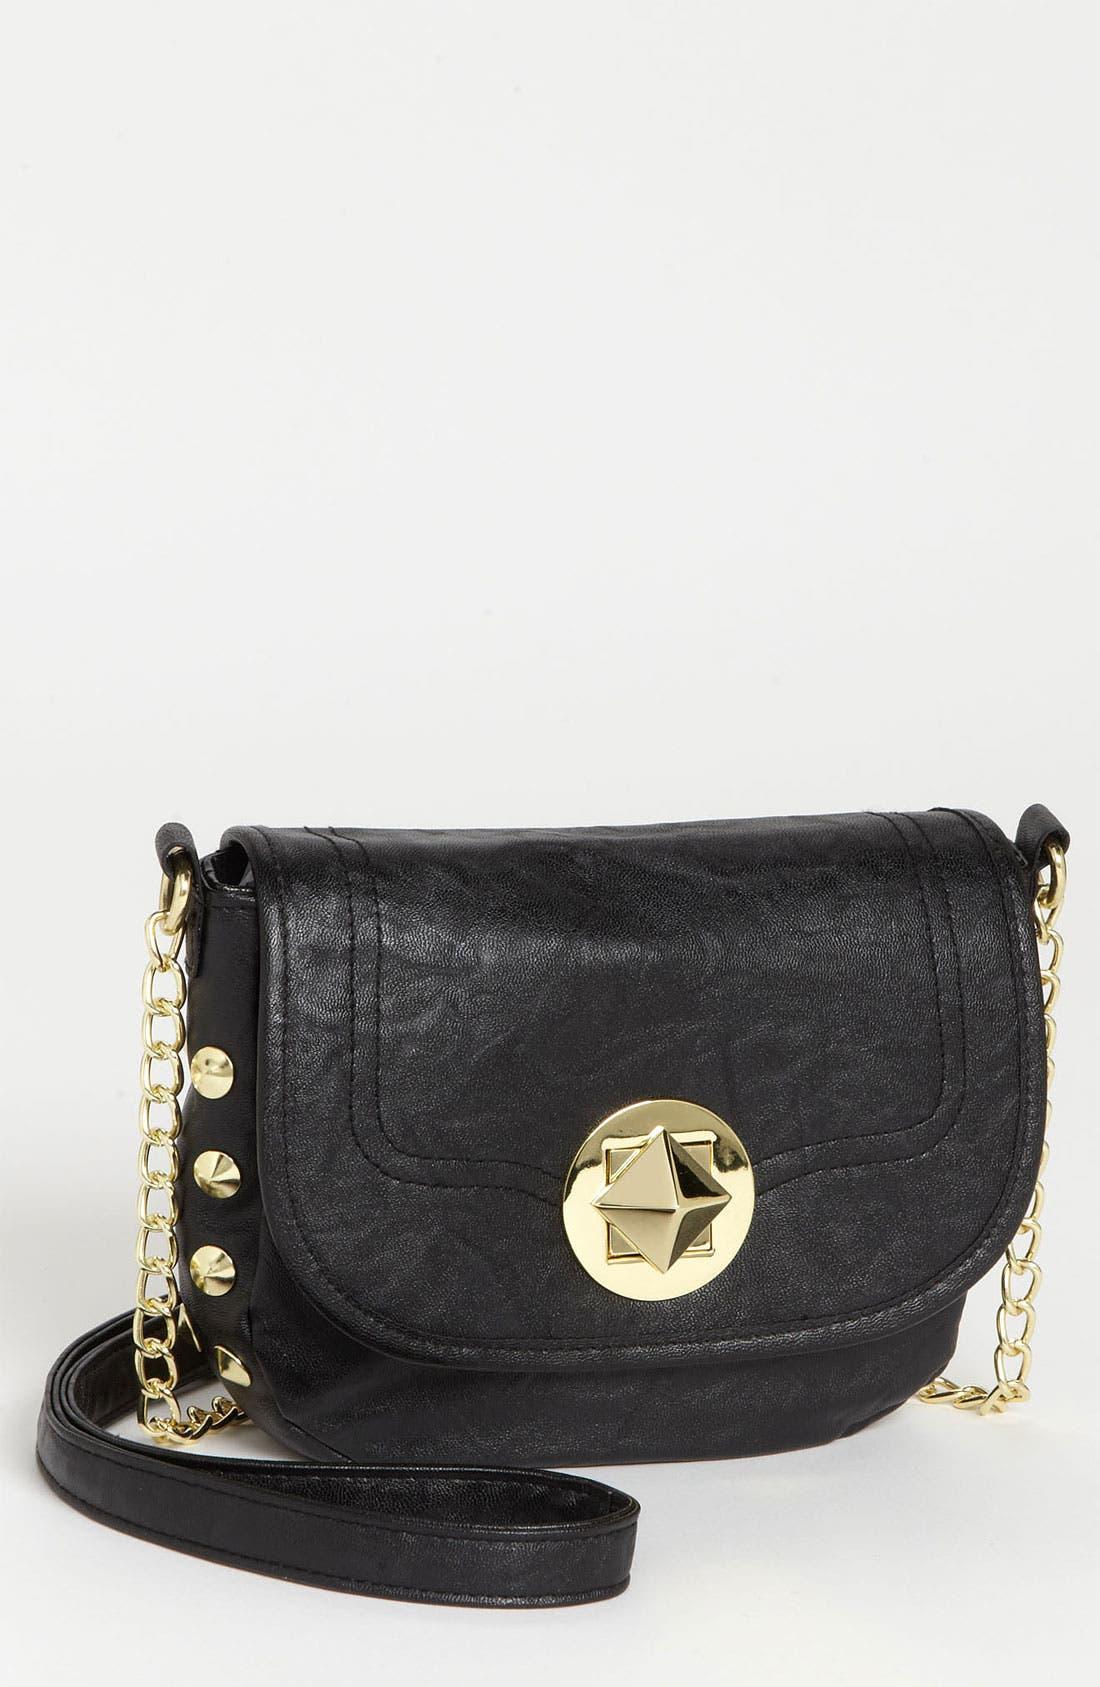 Alternate Image 1 Selected - Lulu Studded Crossbody Bag